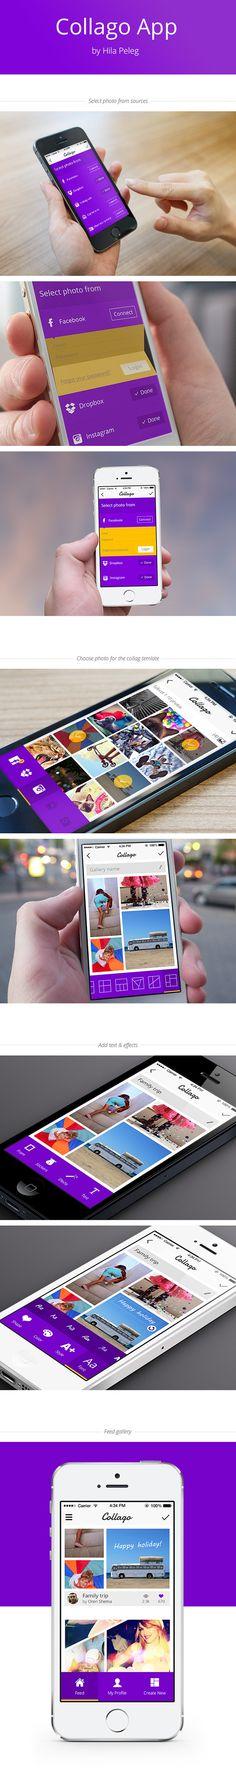 Collage app by hila peleg, via Behance